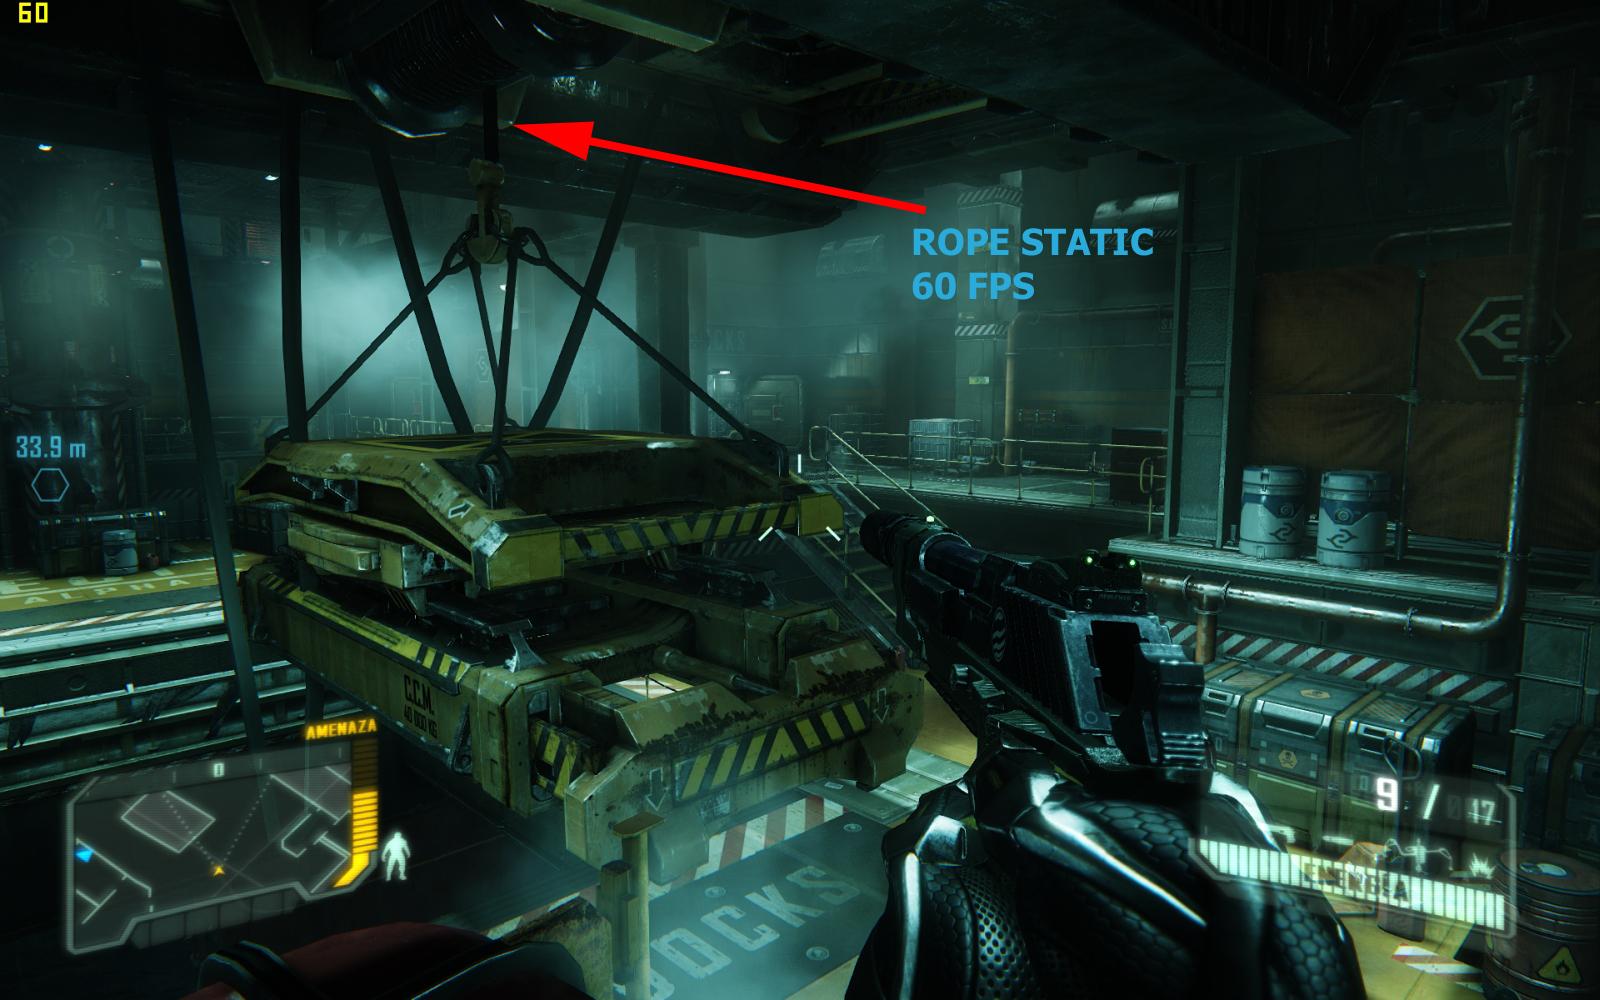 MaLDo Blog: Performance bug in Crysis 3 first level